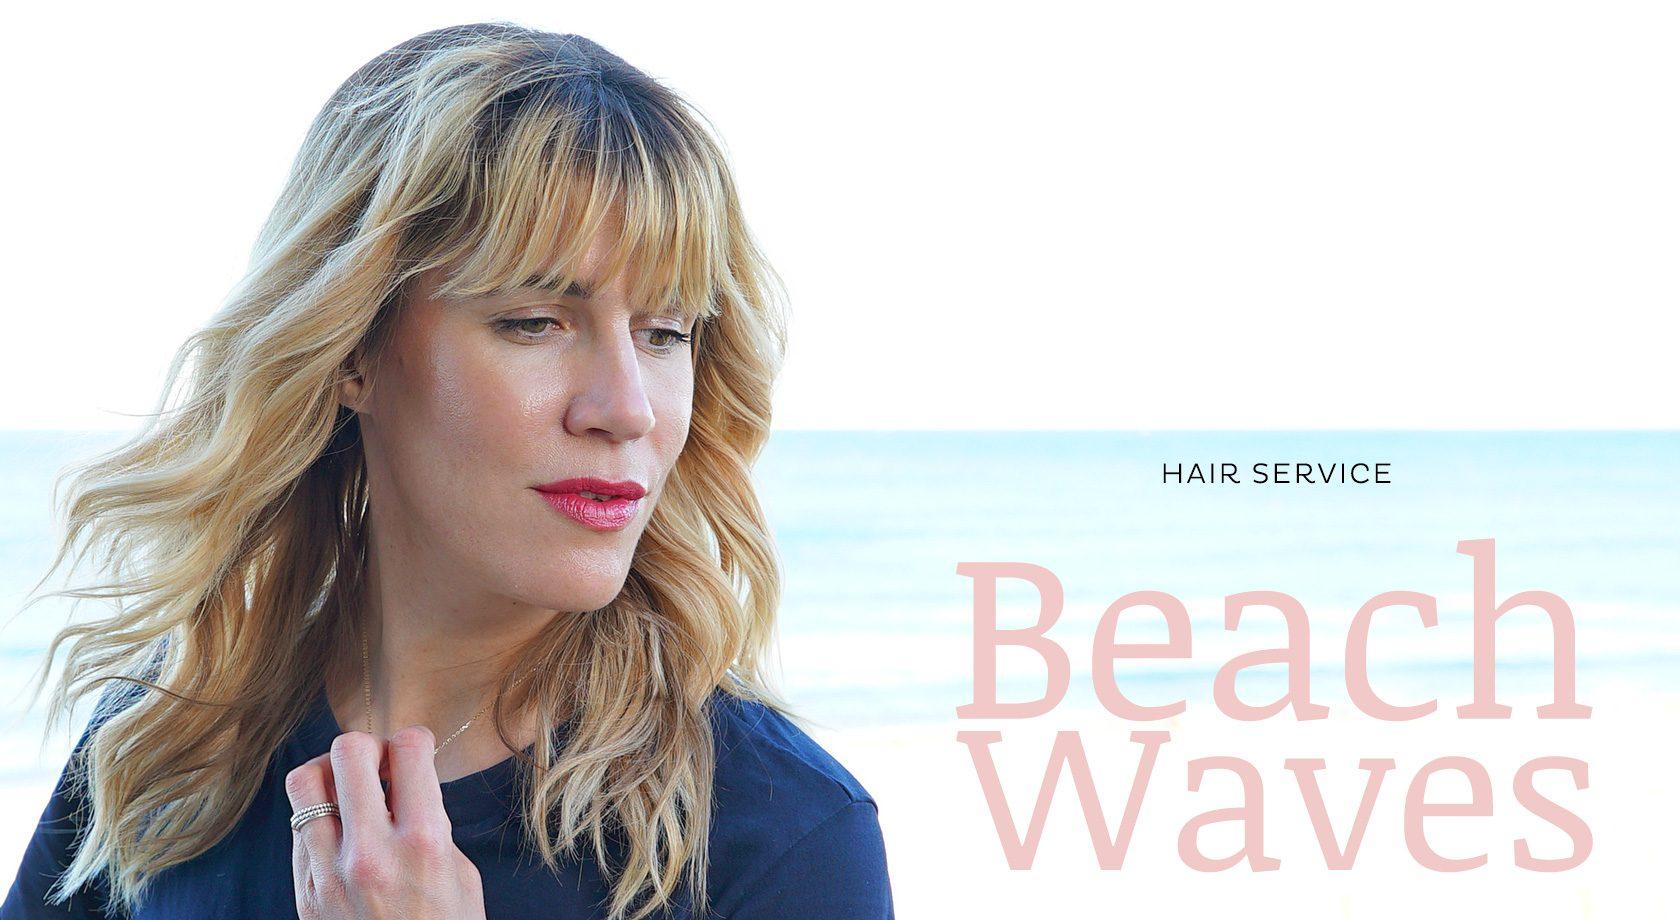 Beachwaves Ganz Ohne Hitze Junemagcom